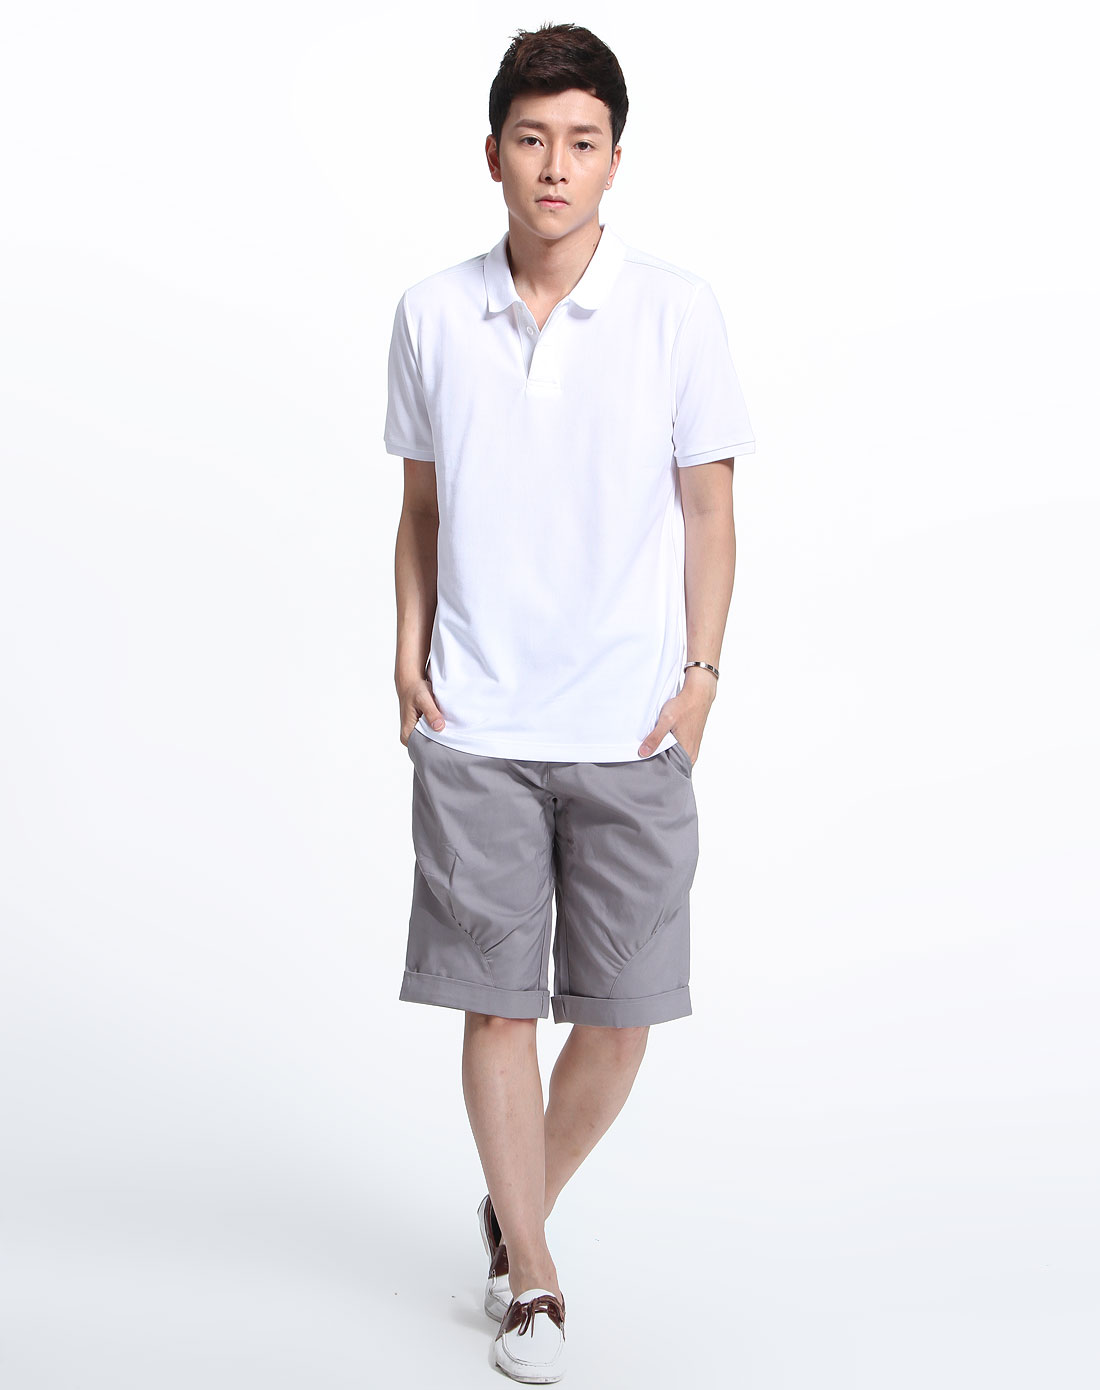 robe di kappa男女男款白色简约短袖上衣r1132ps25